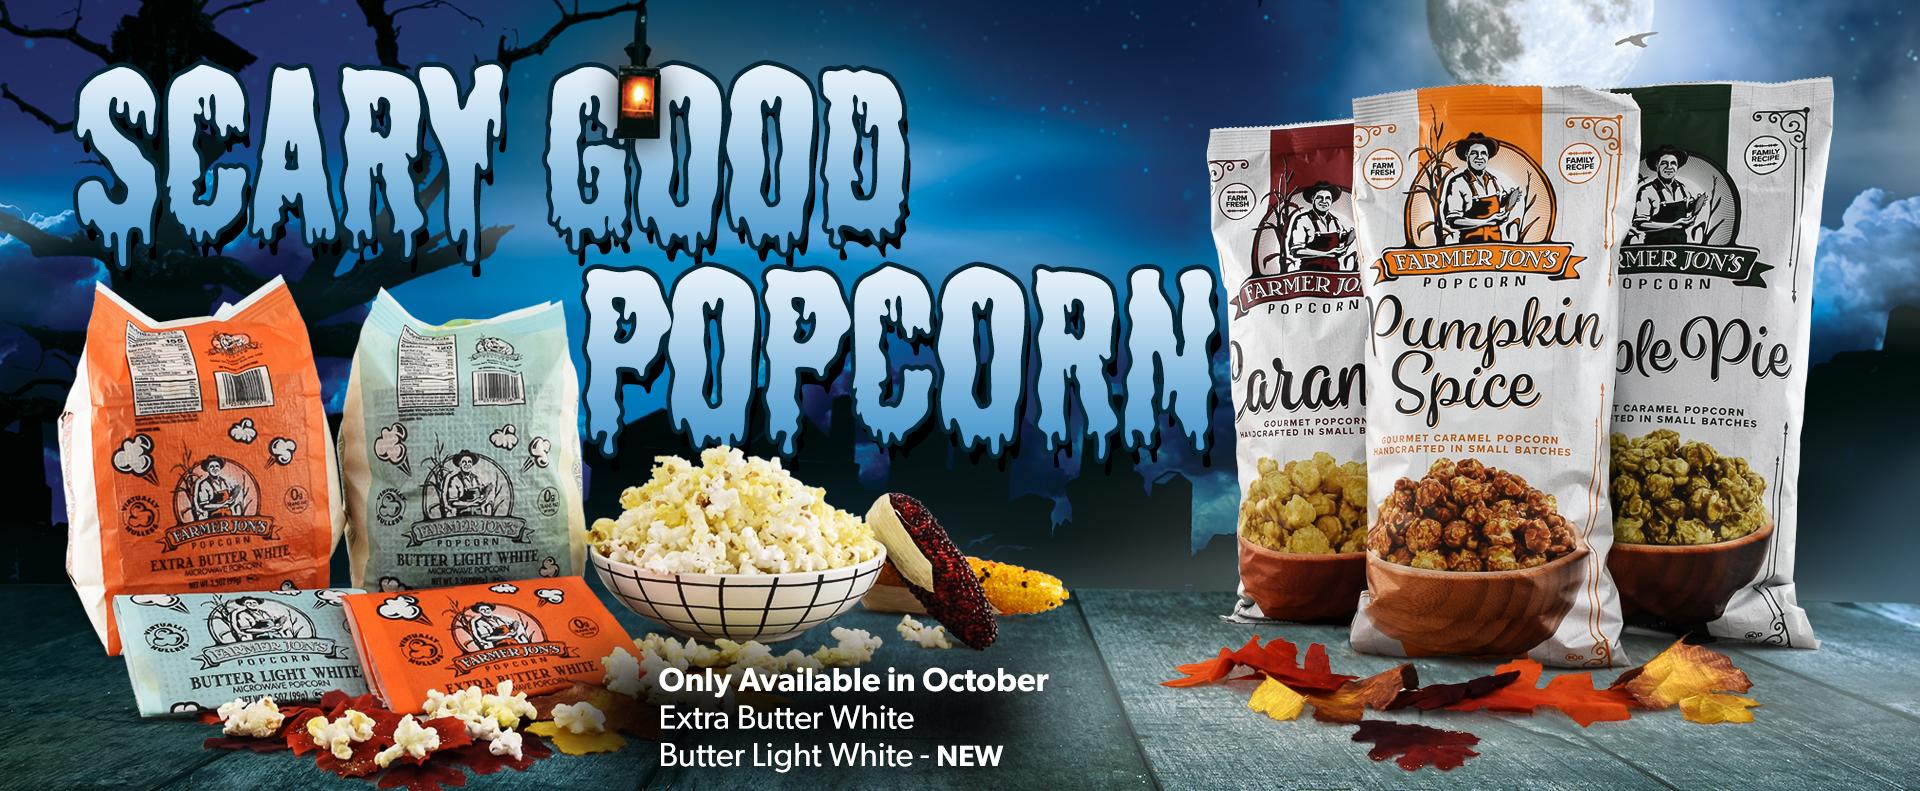 2021-Scary-Good-Popcorn